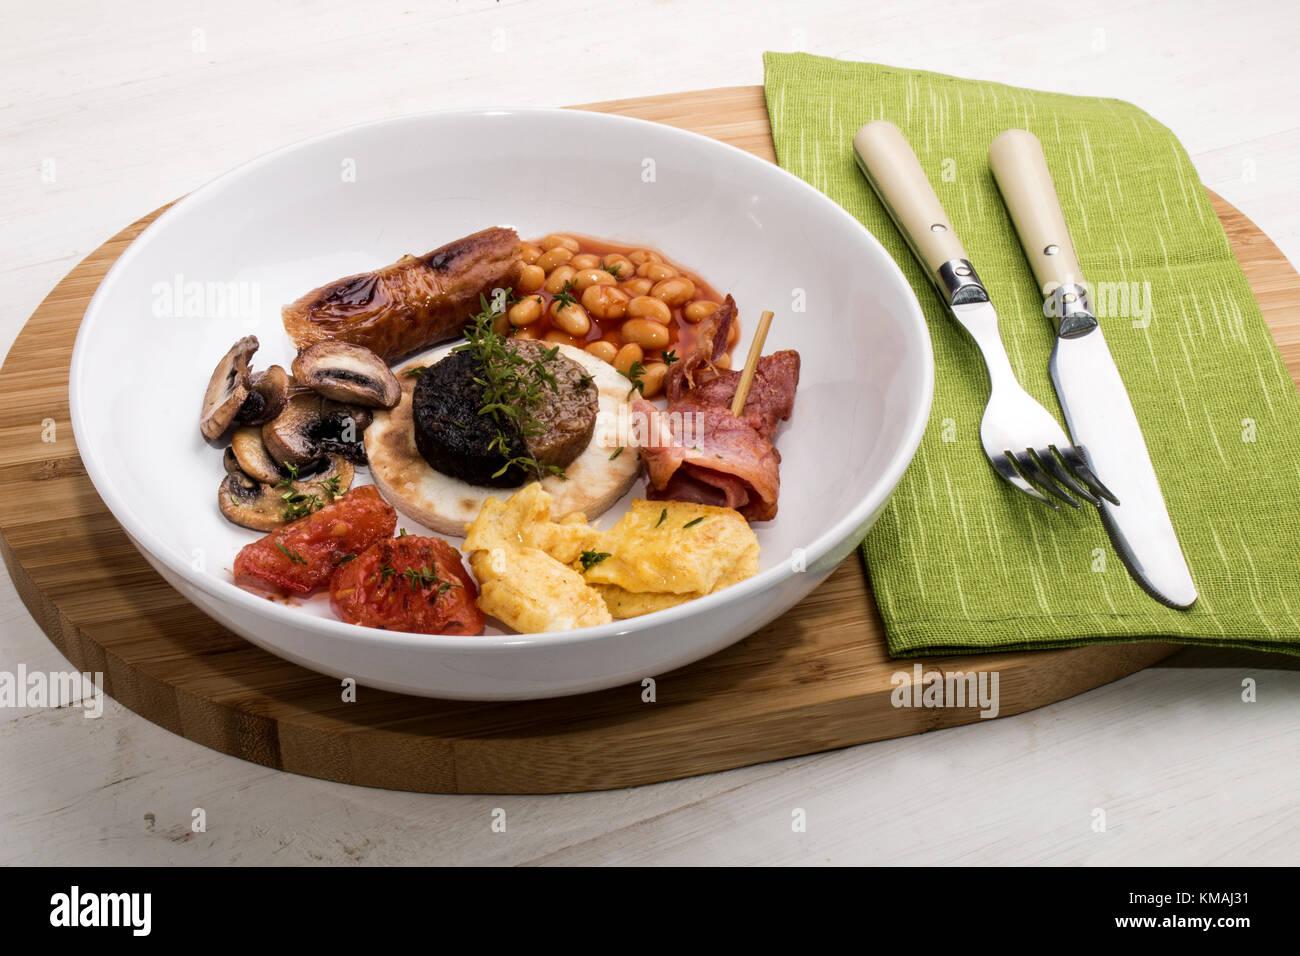 Fine Dinning In Ireland With Irish Breakfast In A Deep Plate